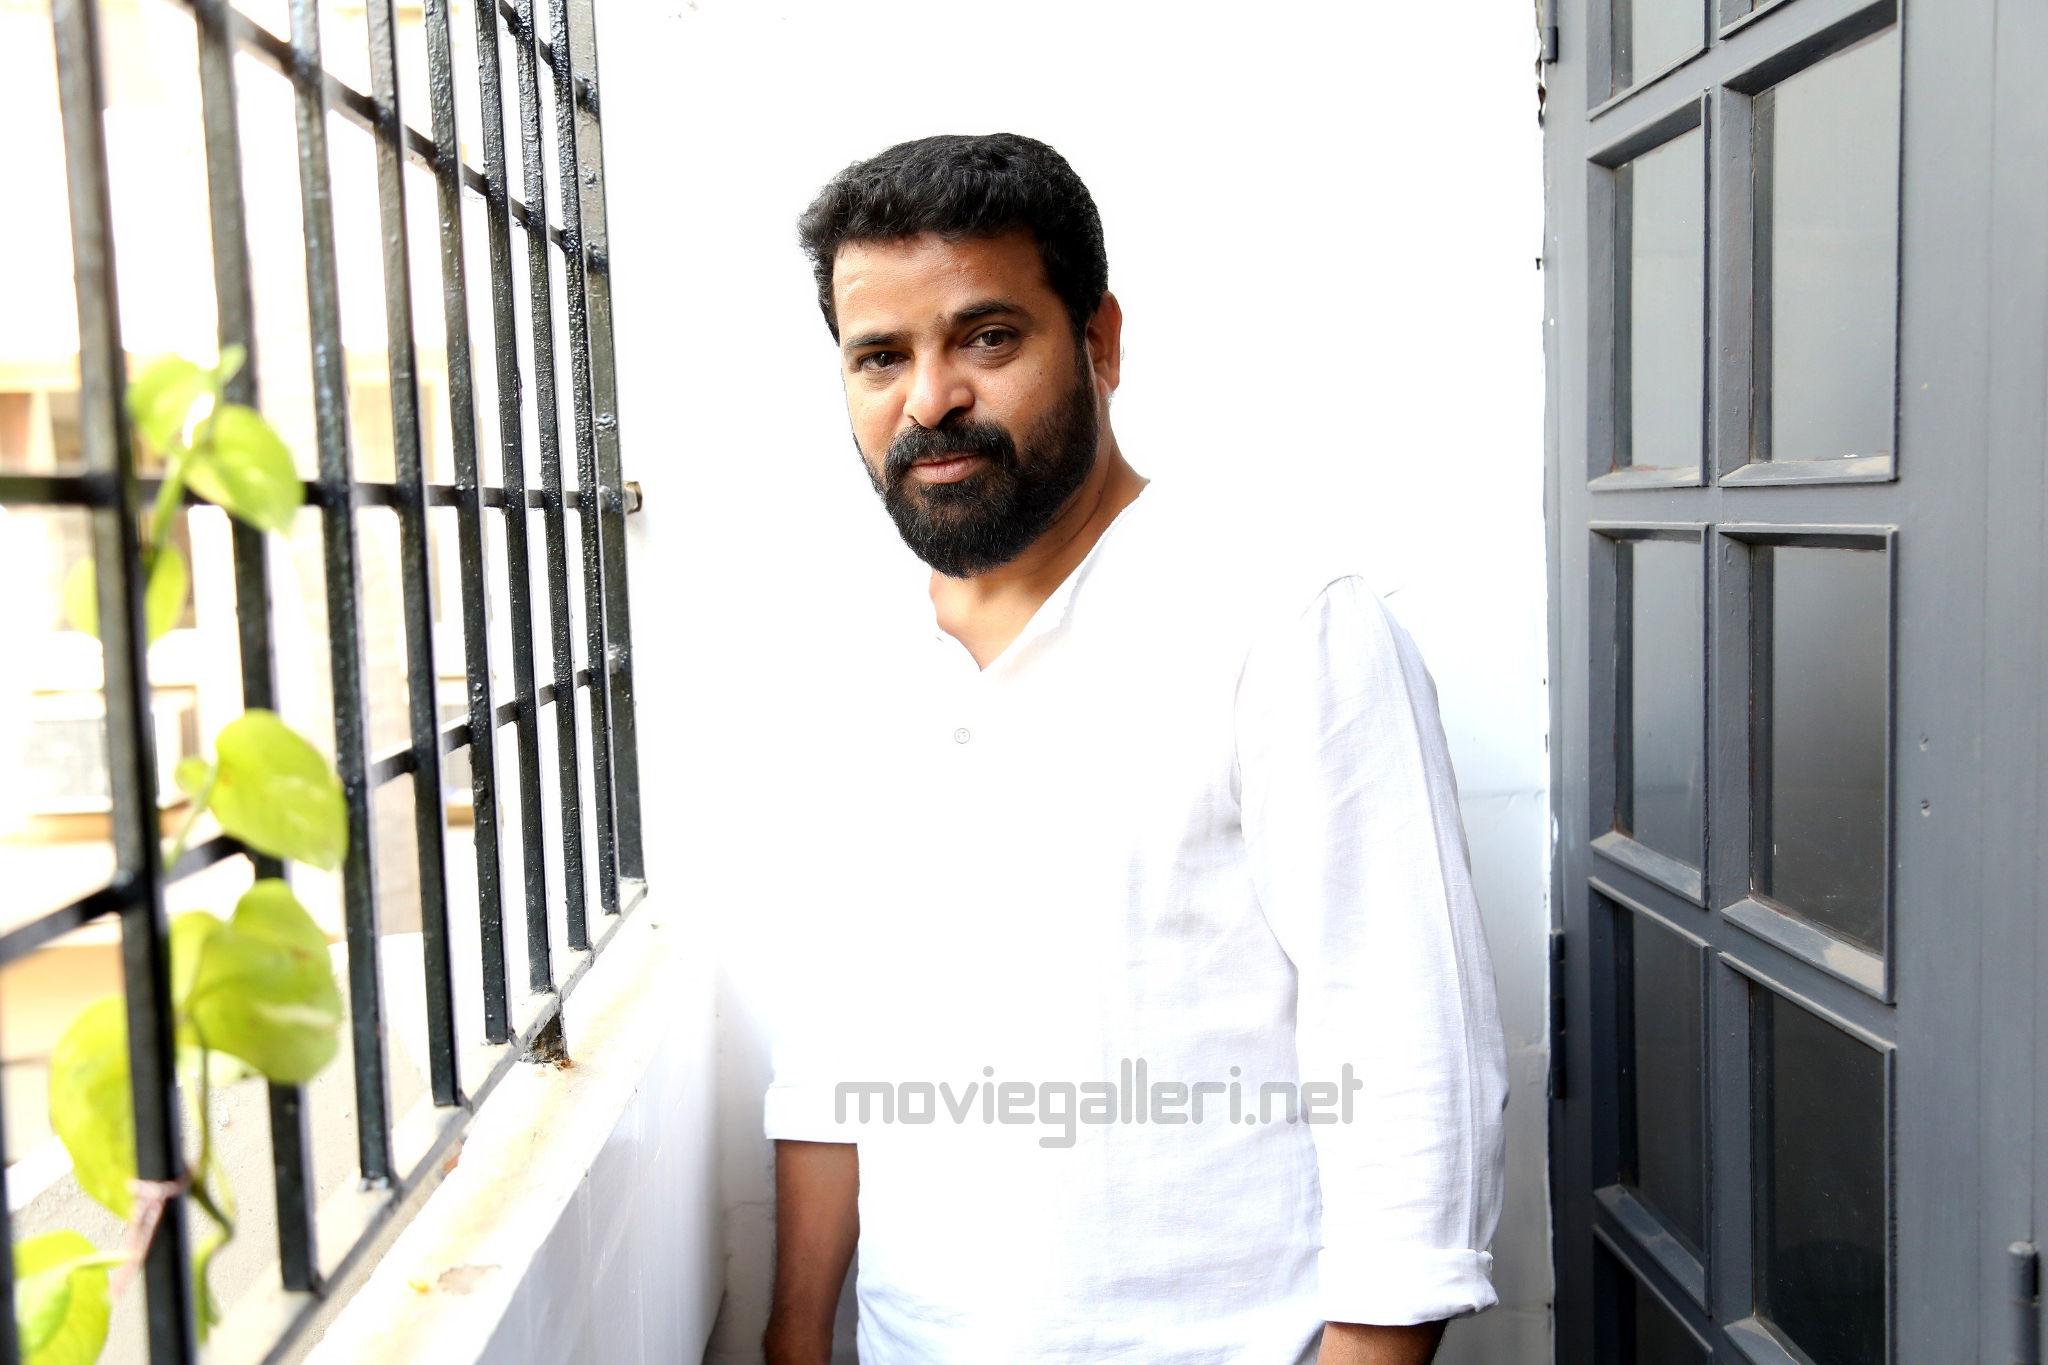 Actor Ameer Sultan replaced Vijay Sethupathi in Vada Chennai